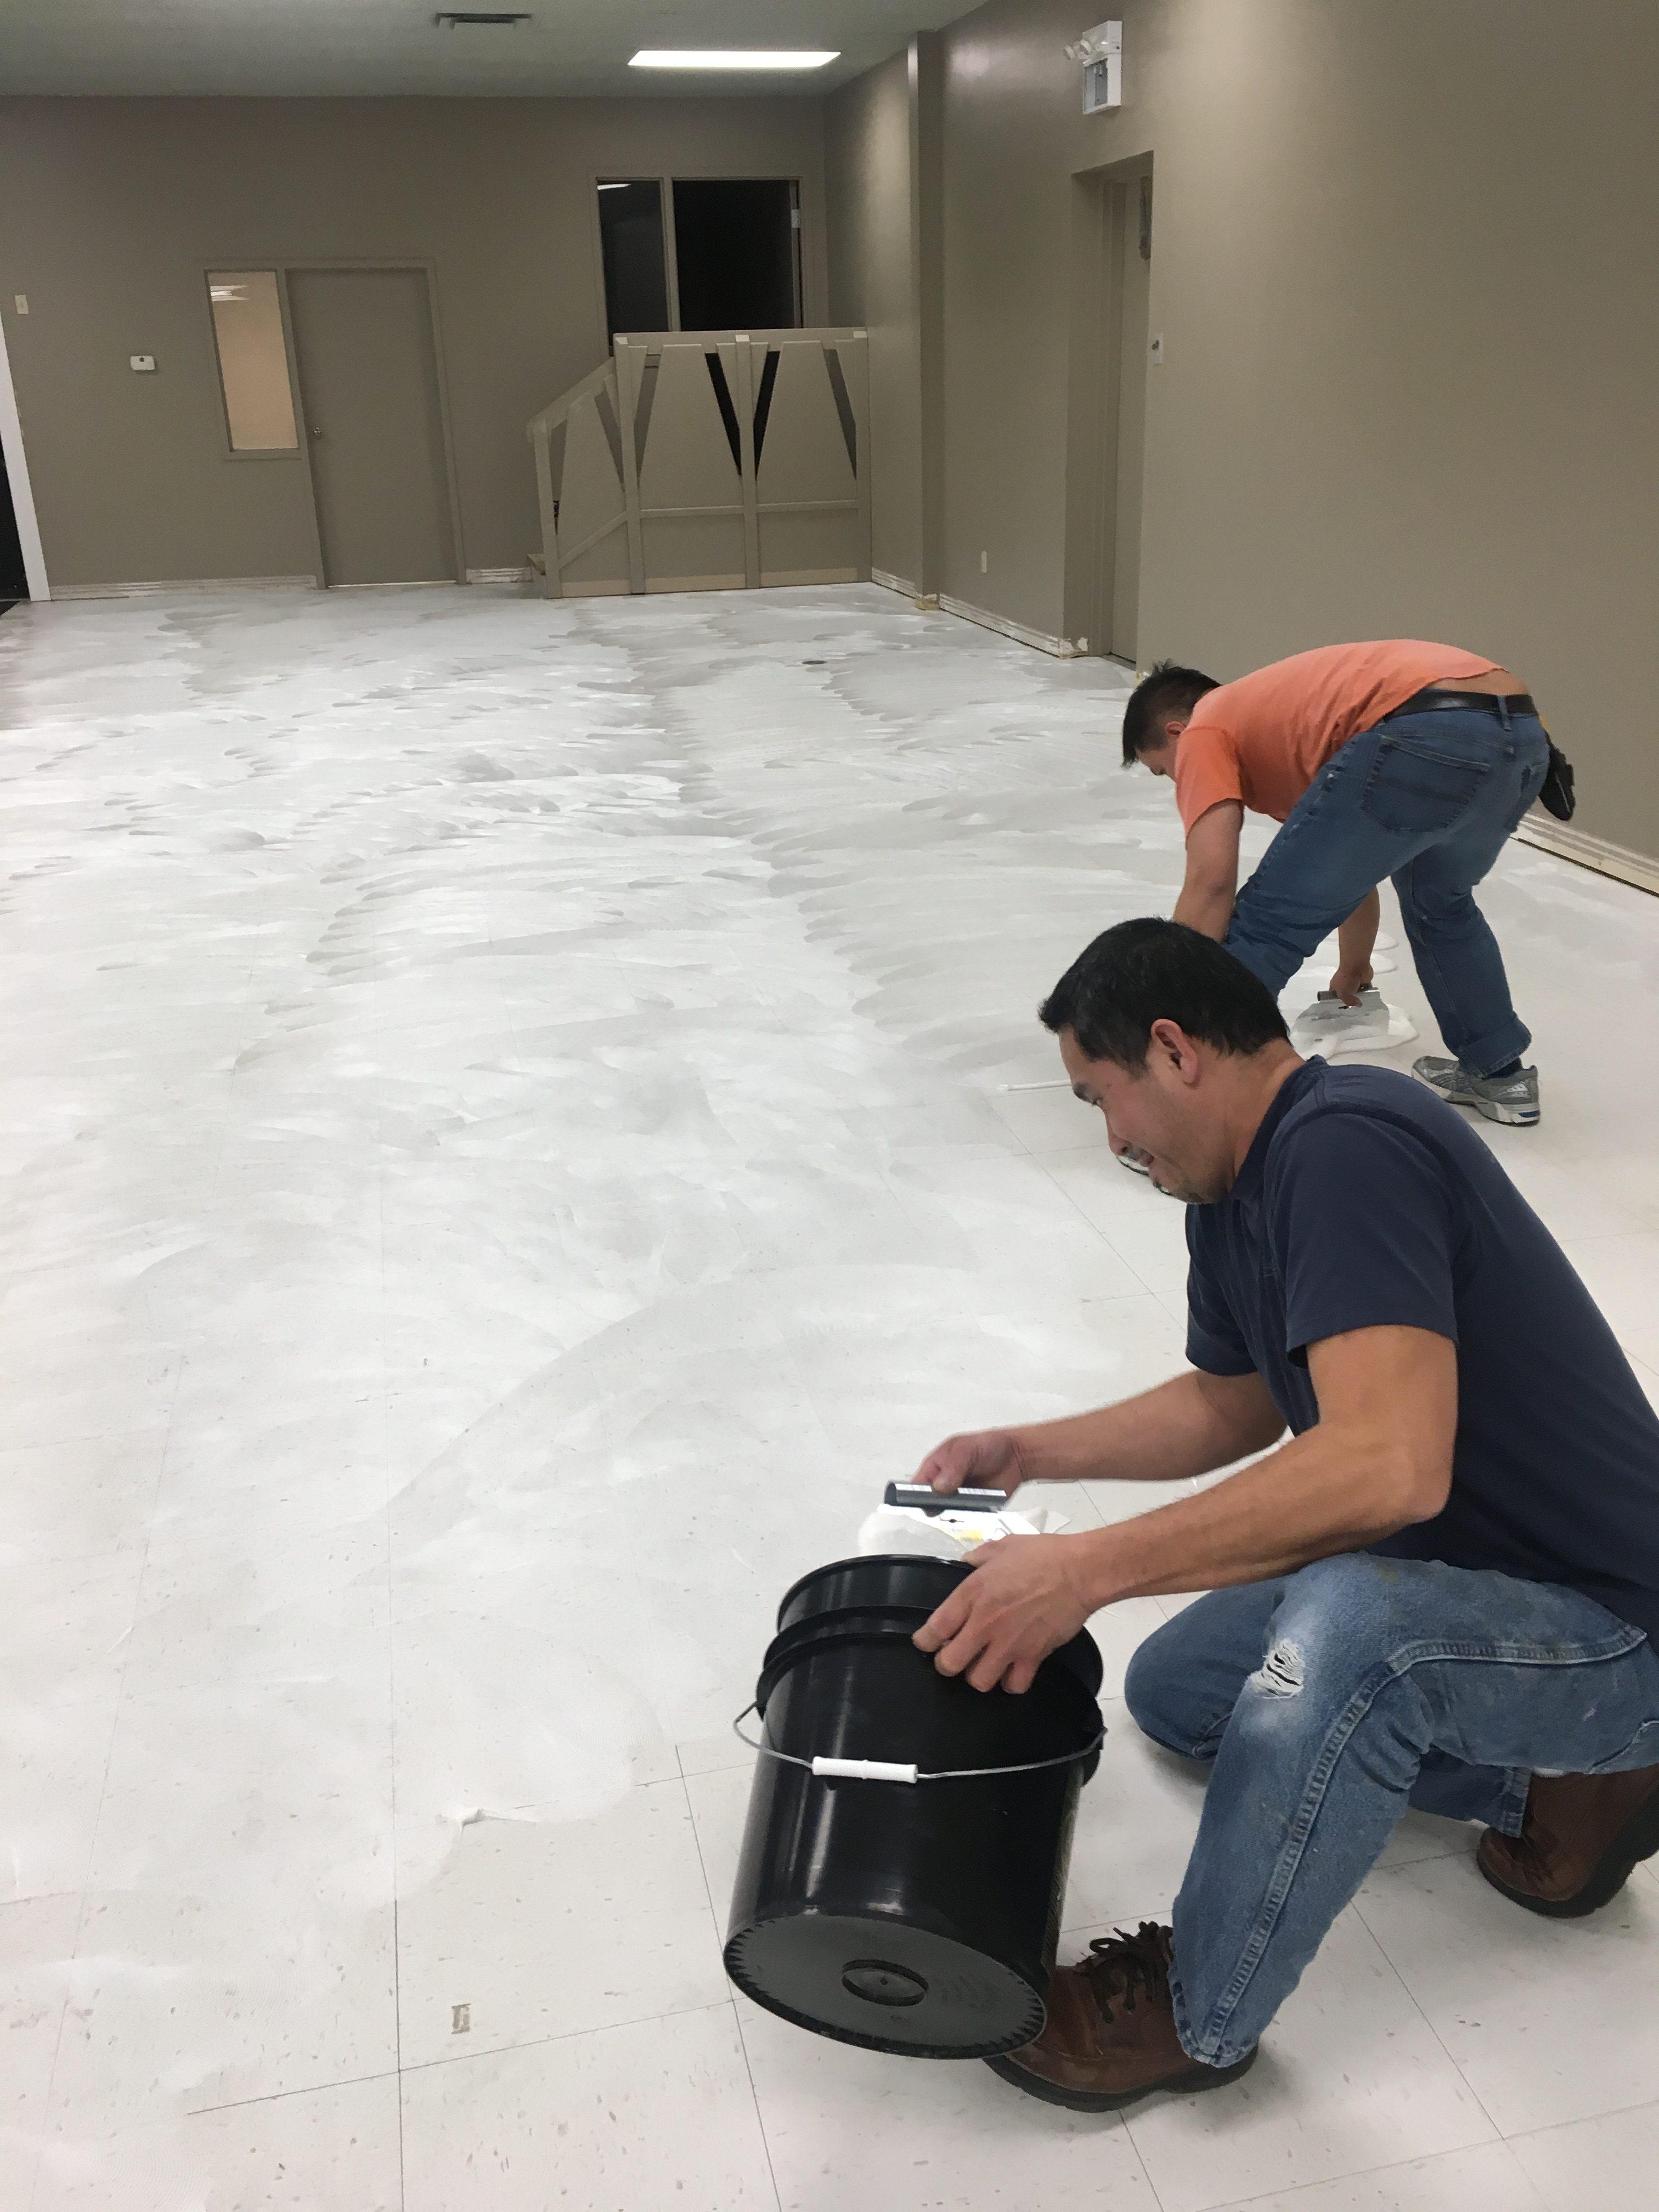 Contractors mudding concrete floor